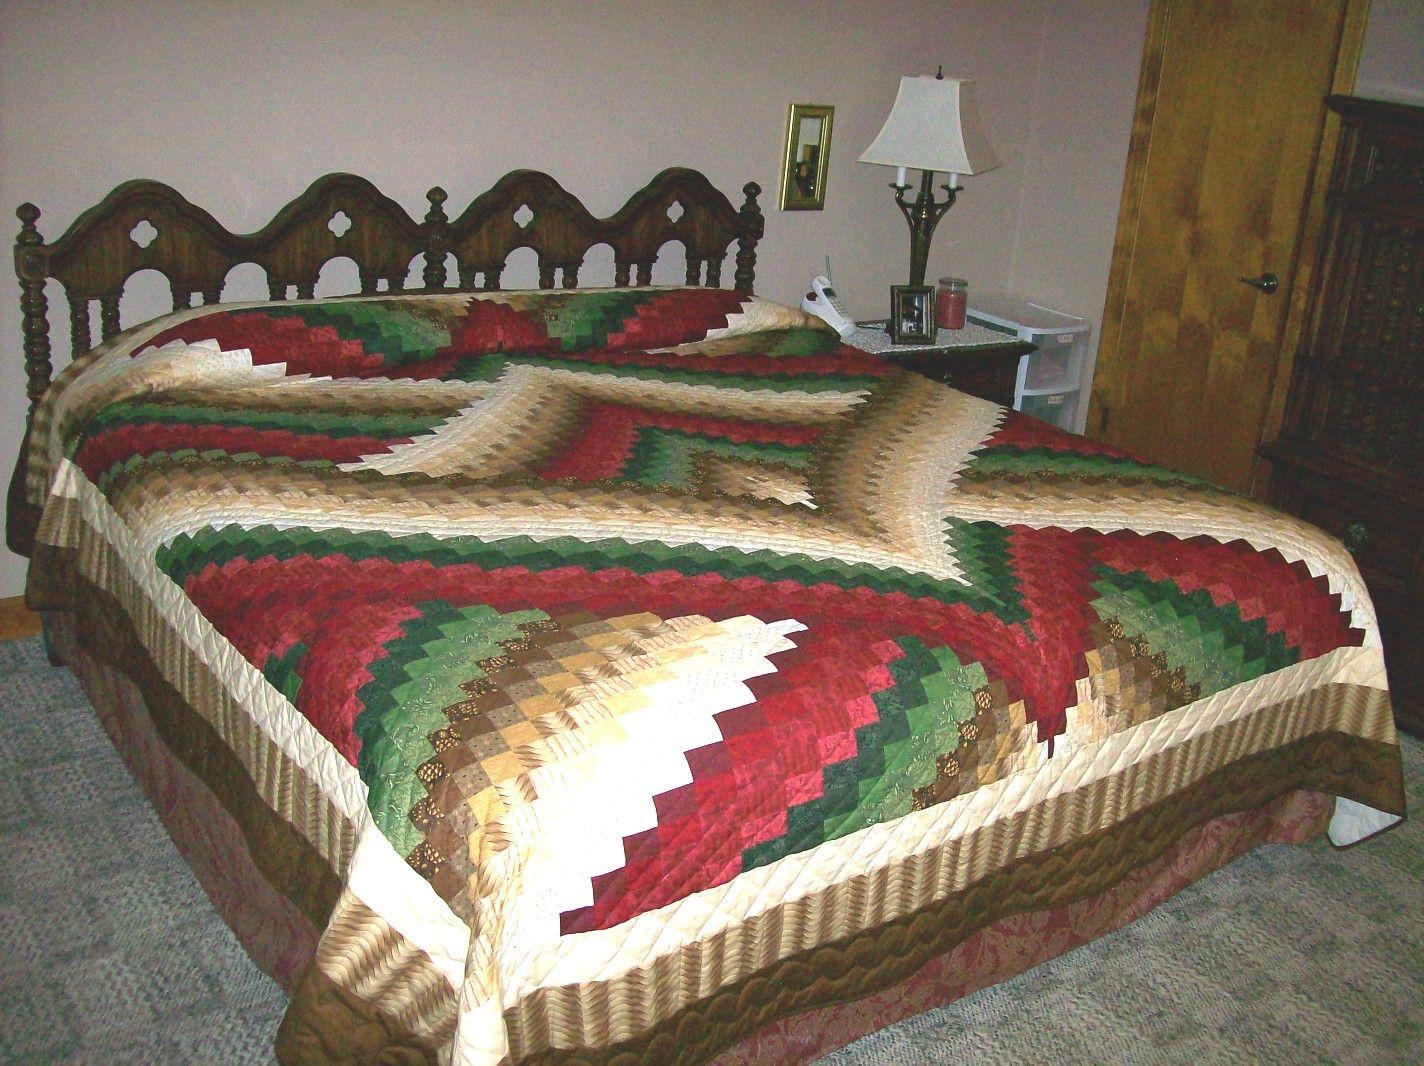 Quilting Fabric | ... quilt | quilting classes | quilting fabric ... : bargello quilt kits - Adamdwight.com